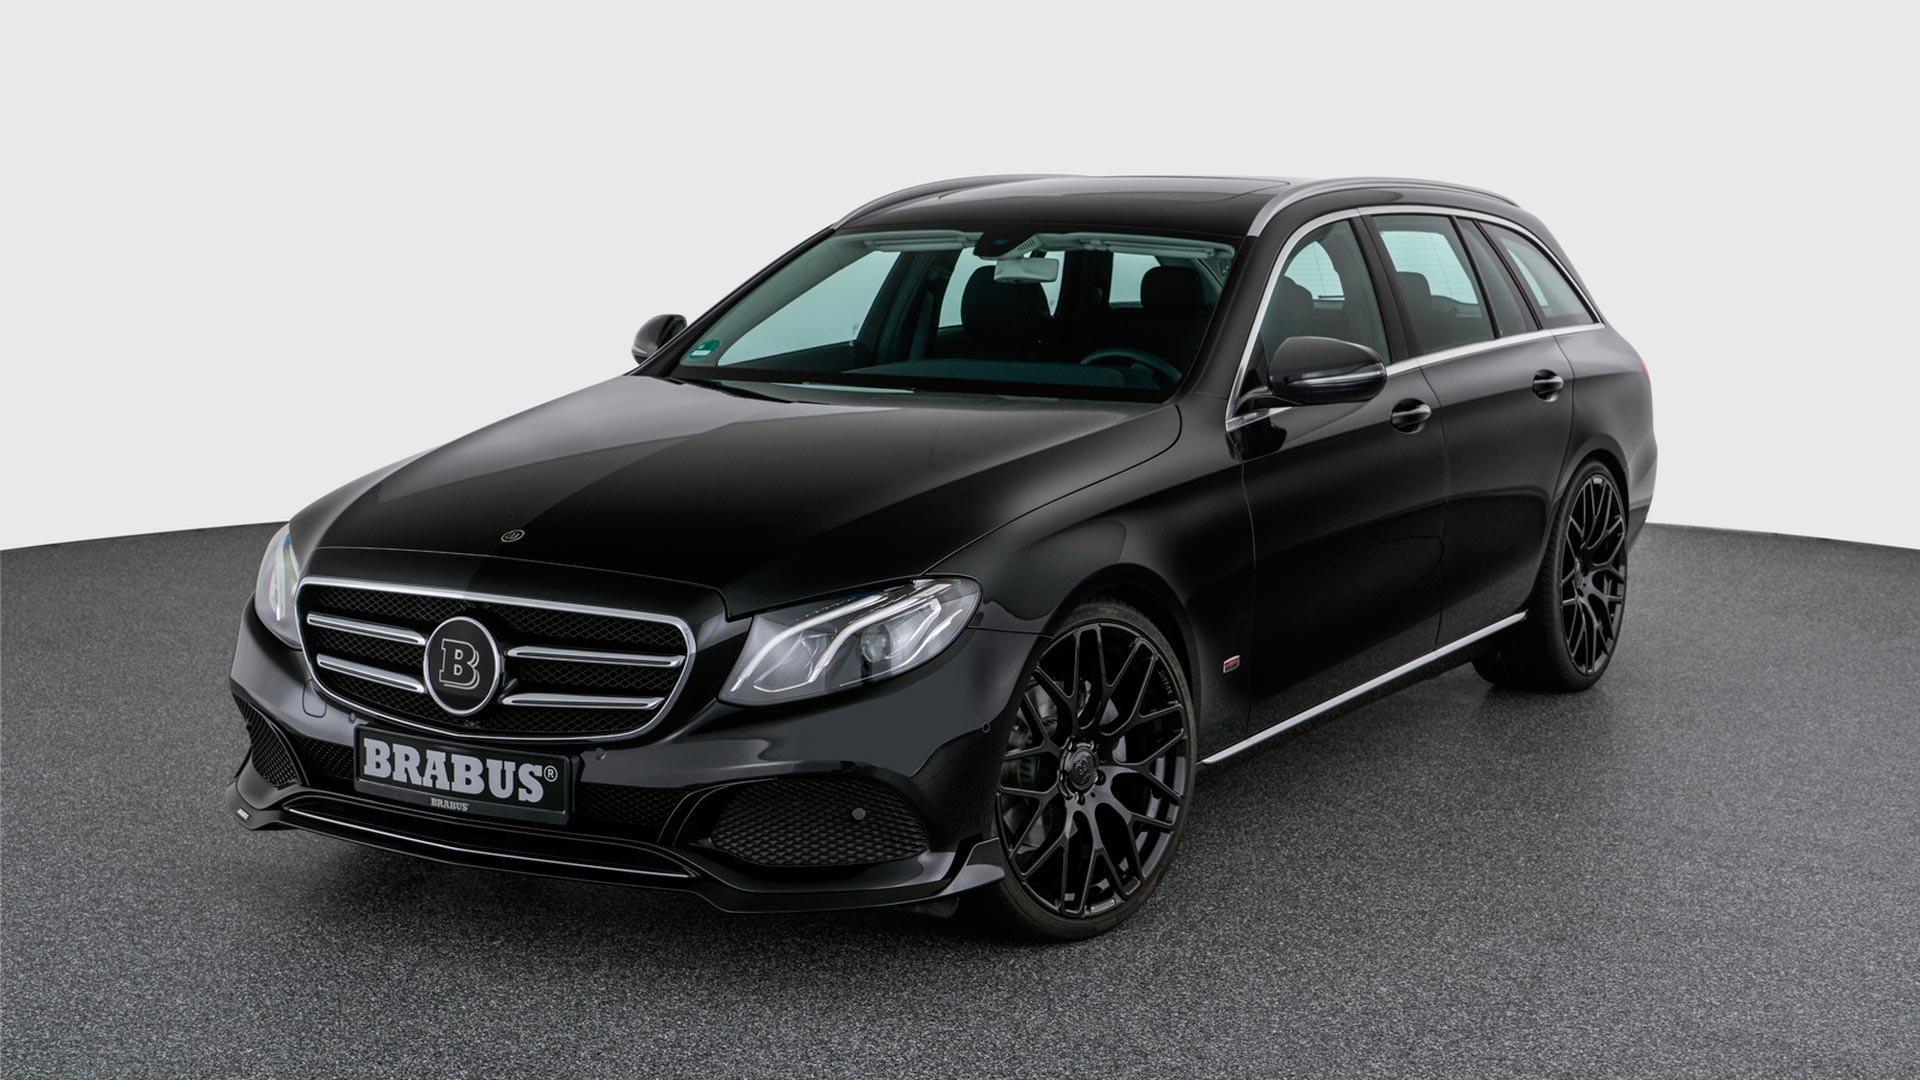 Mercedes-Benz E-Class: Suspension tuning